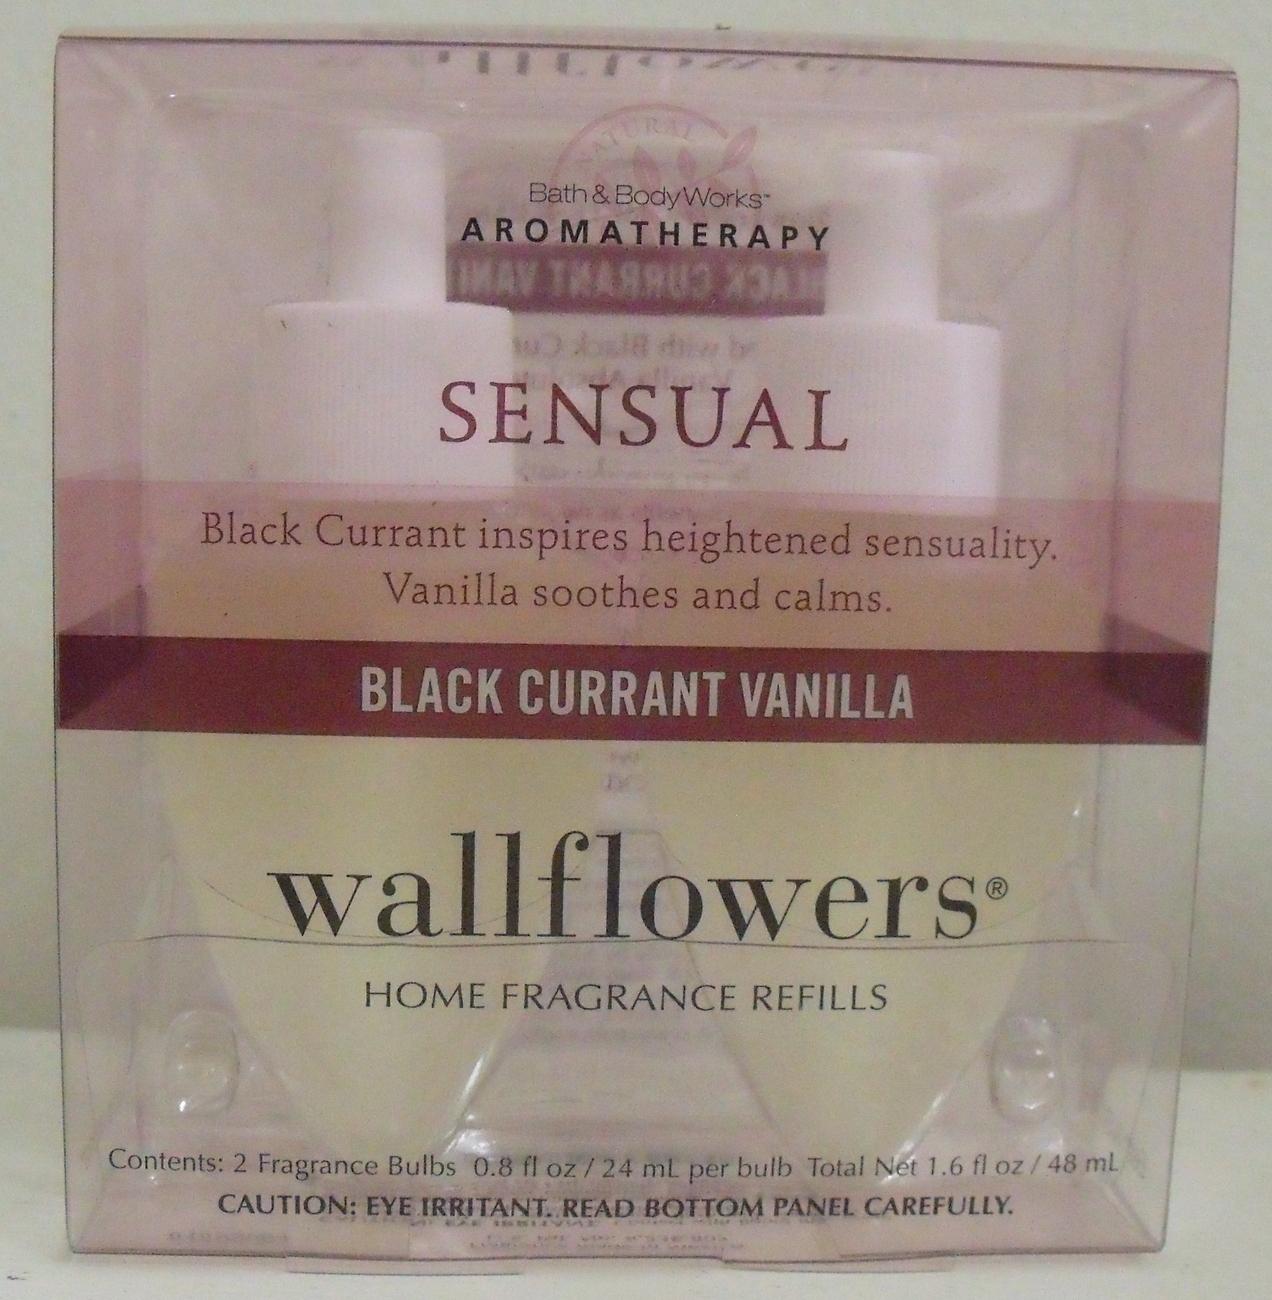 Black_currant_vanilla_wallflower